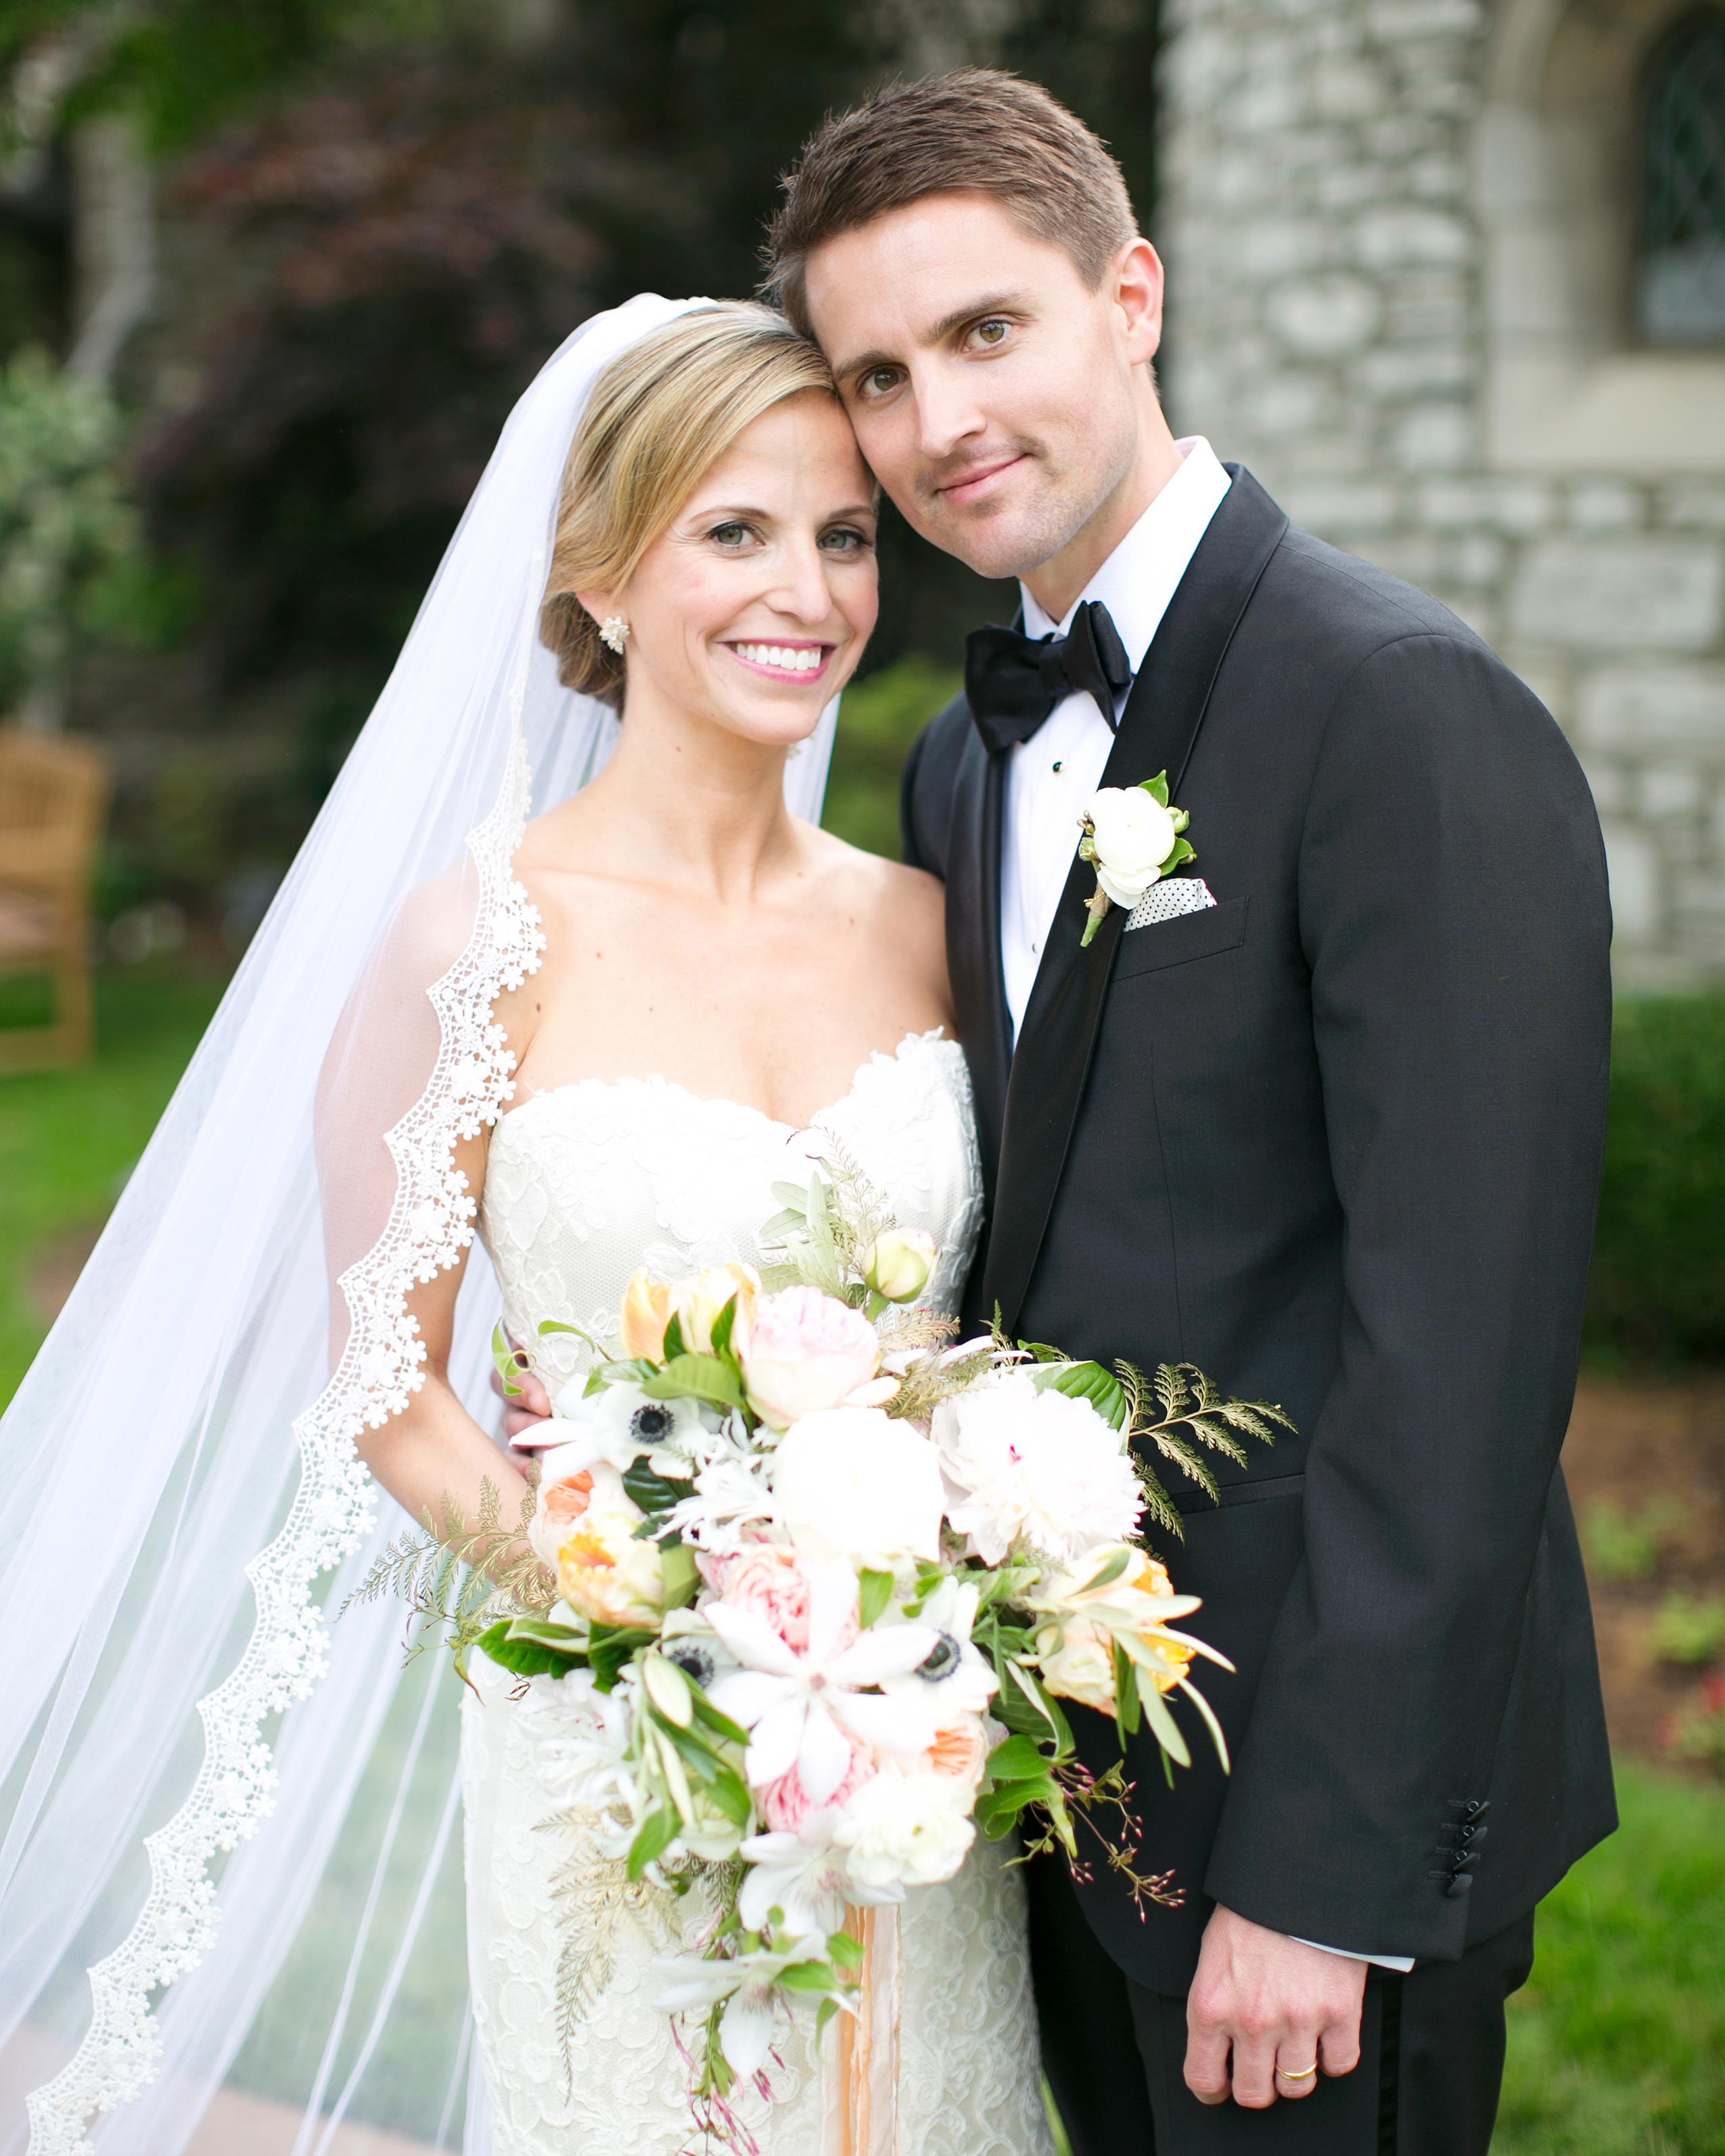 courtney-michael-wedding-05-s111677-0215.jpg